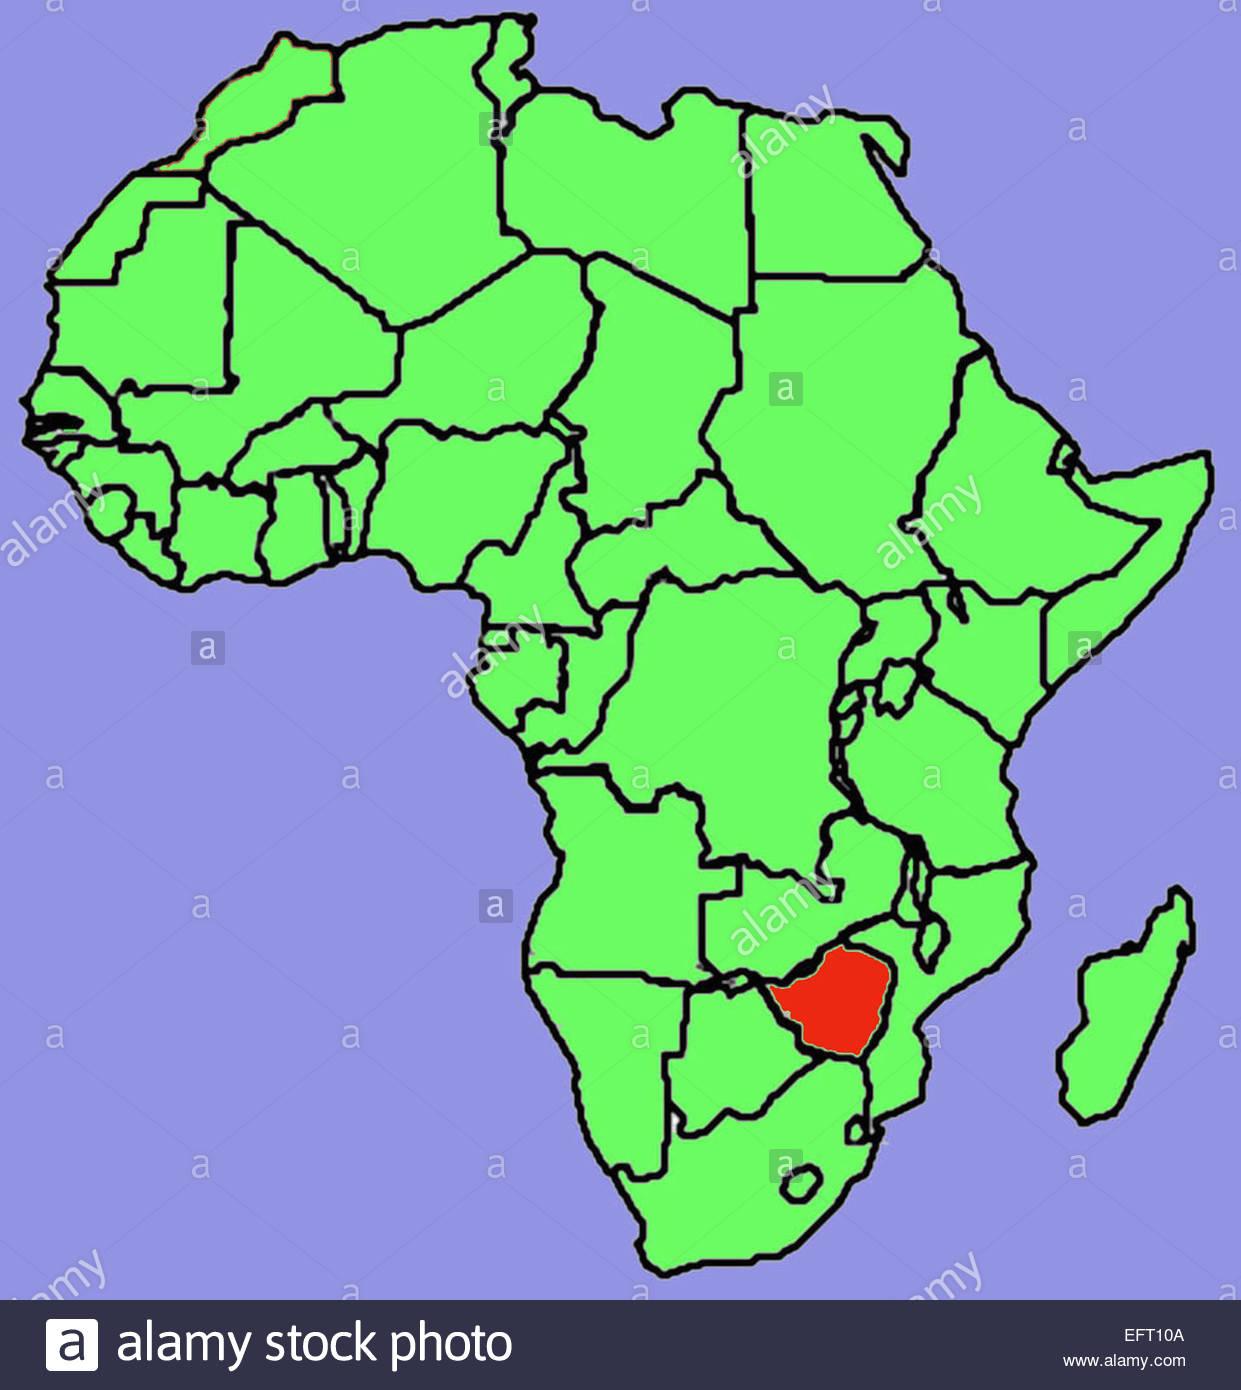 Map Of Africa Zimbabwe.Map Republic Of Zimbabwe Southern Africa Zwe African Continent Stock